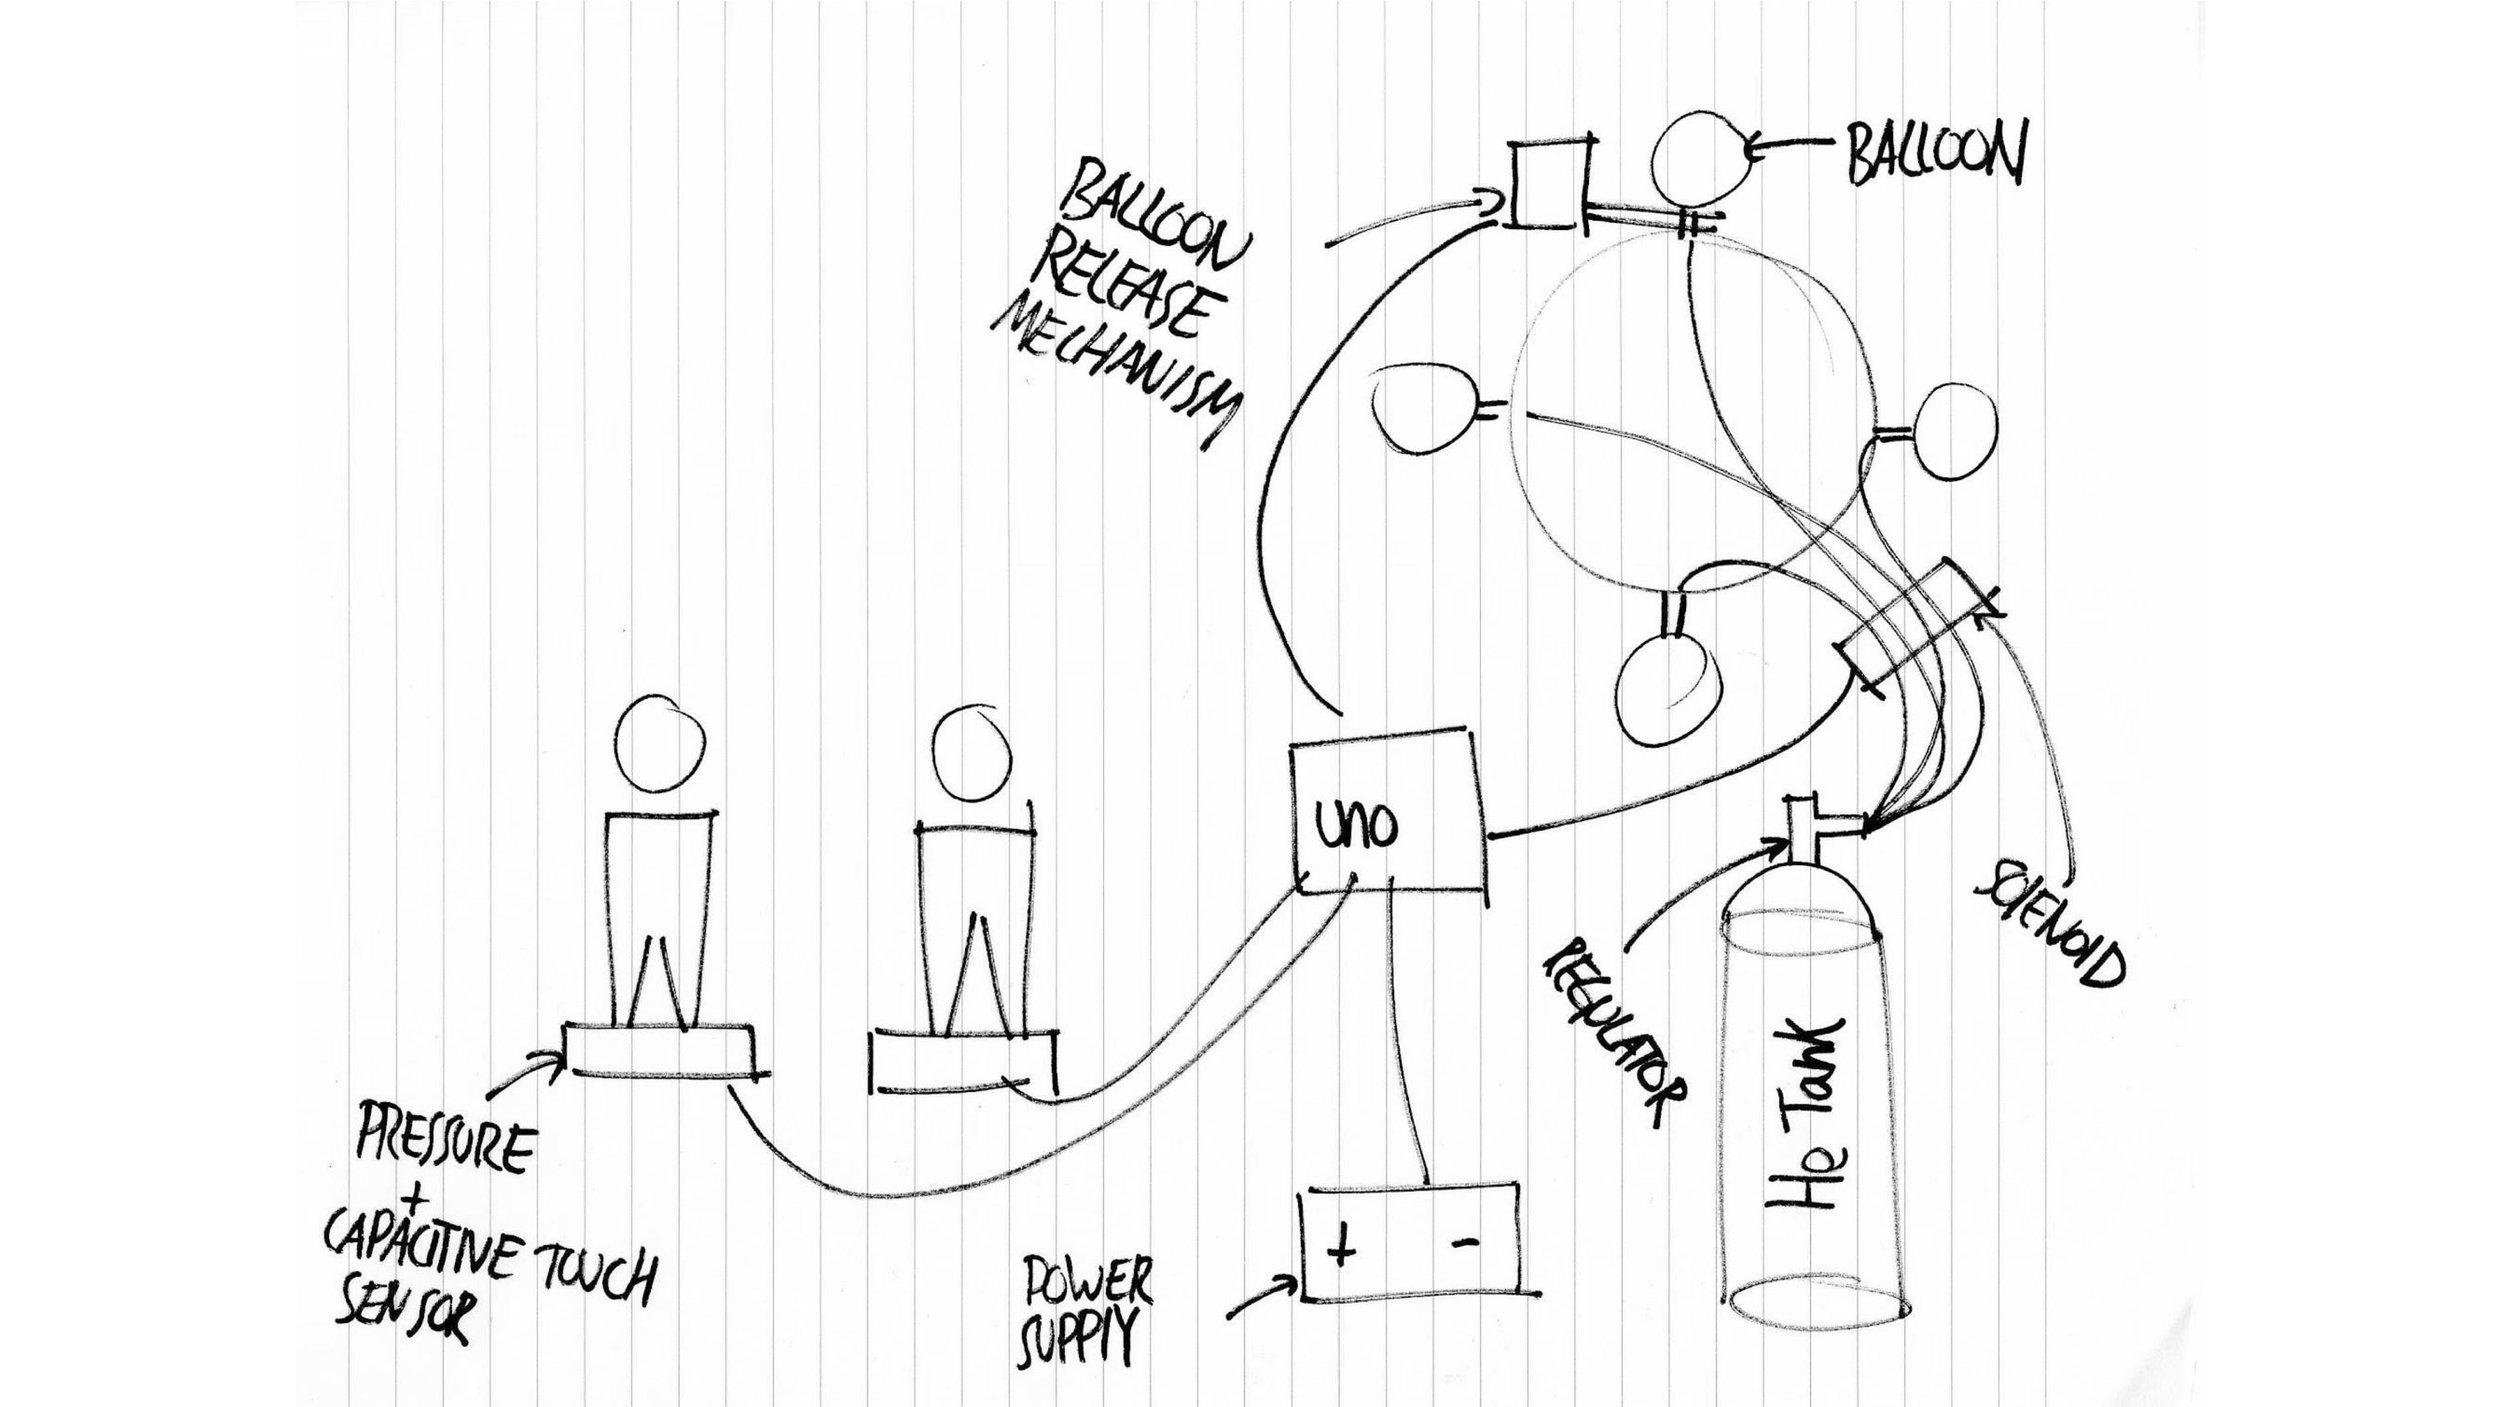 Ballon Project Presentation Sketch Export-page-003.jpg